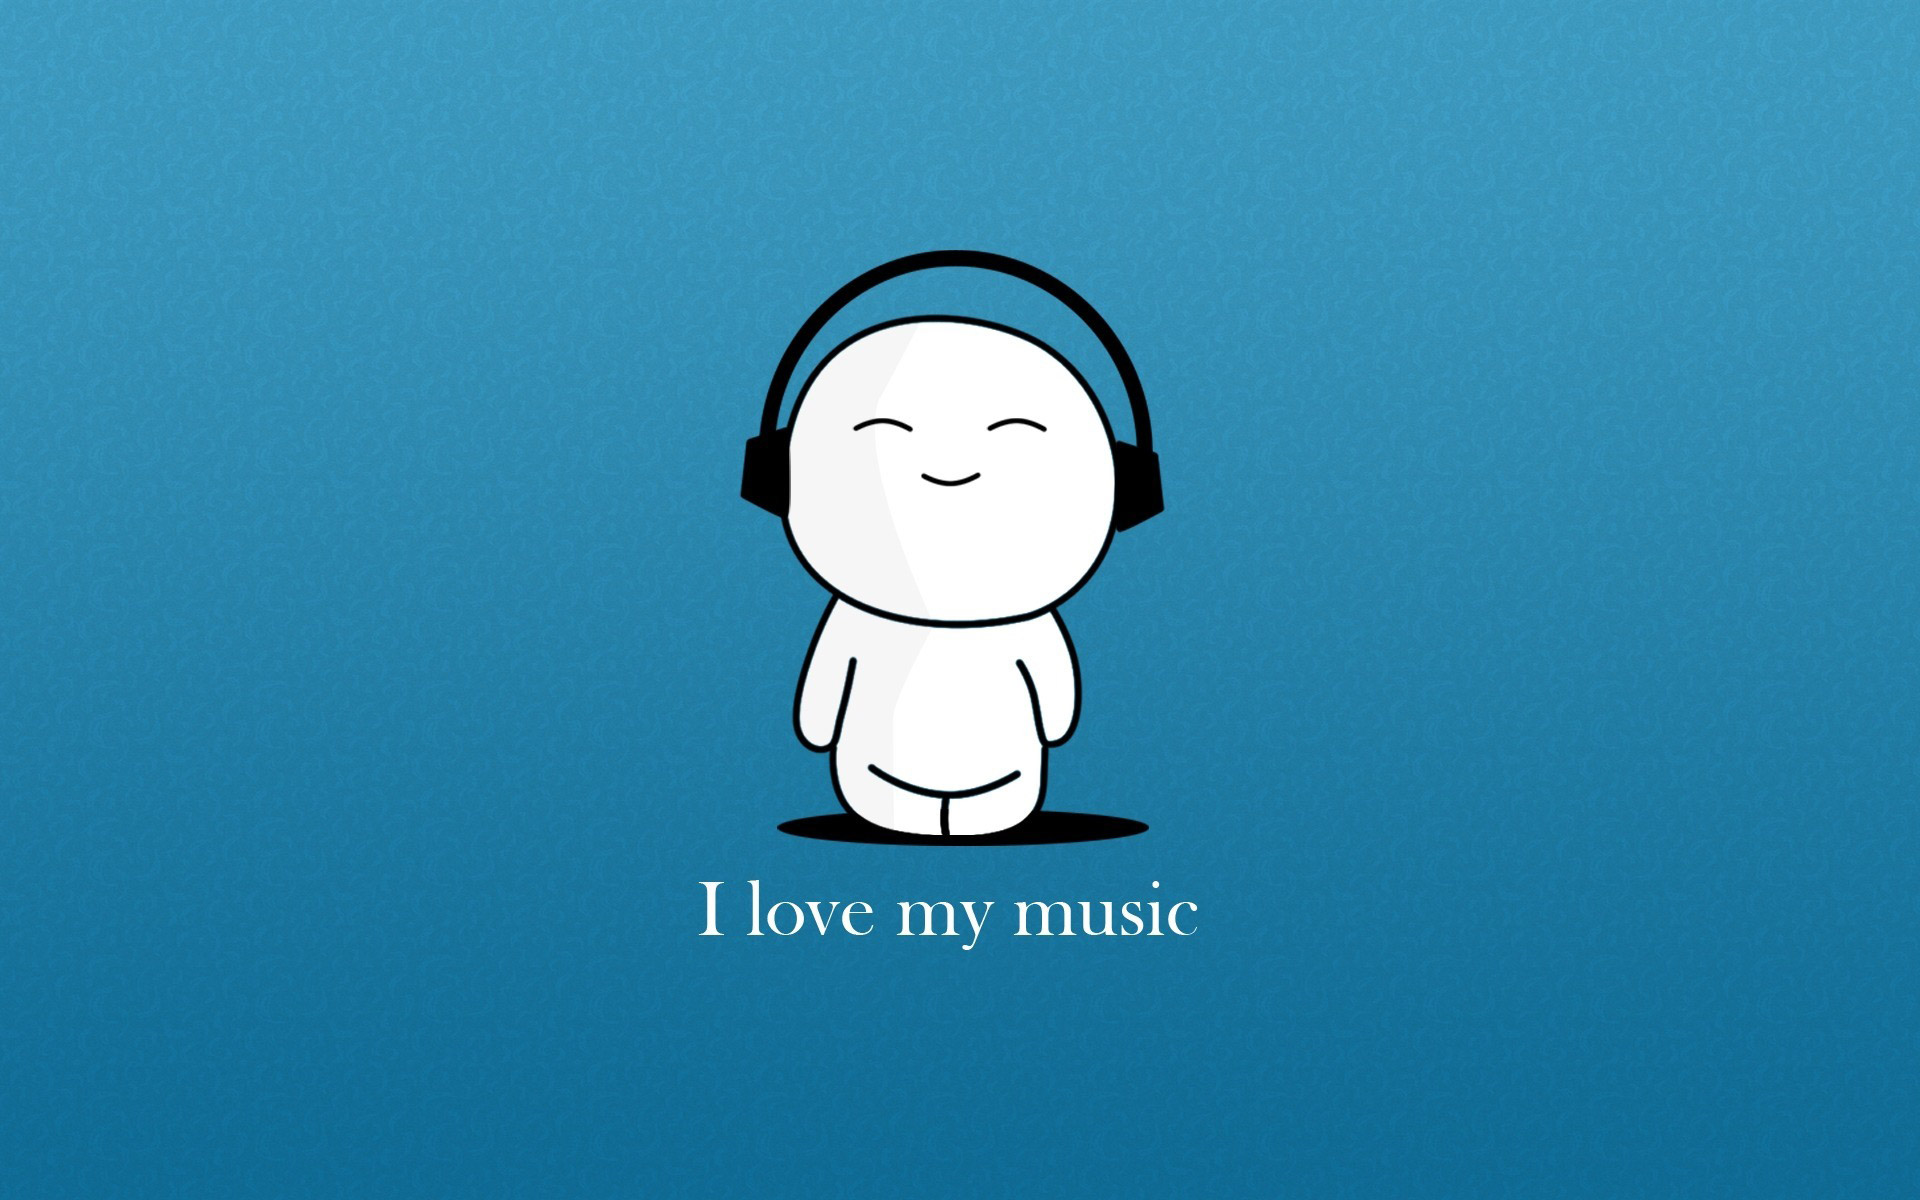 Must see Wallpaper Blue Music - music-wallpaper-blue-cartoon  You Should Have_75904.jpg